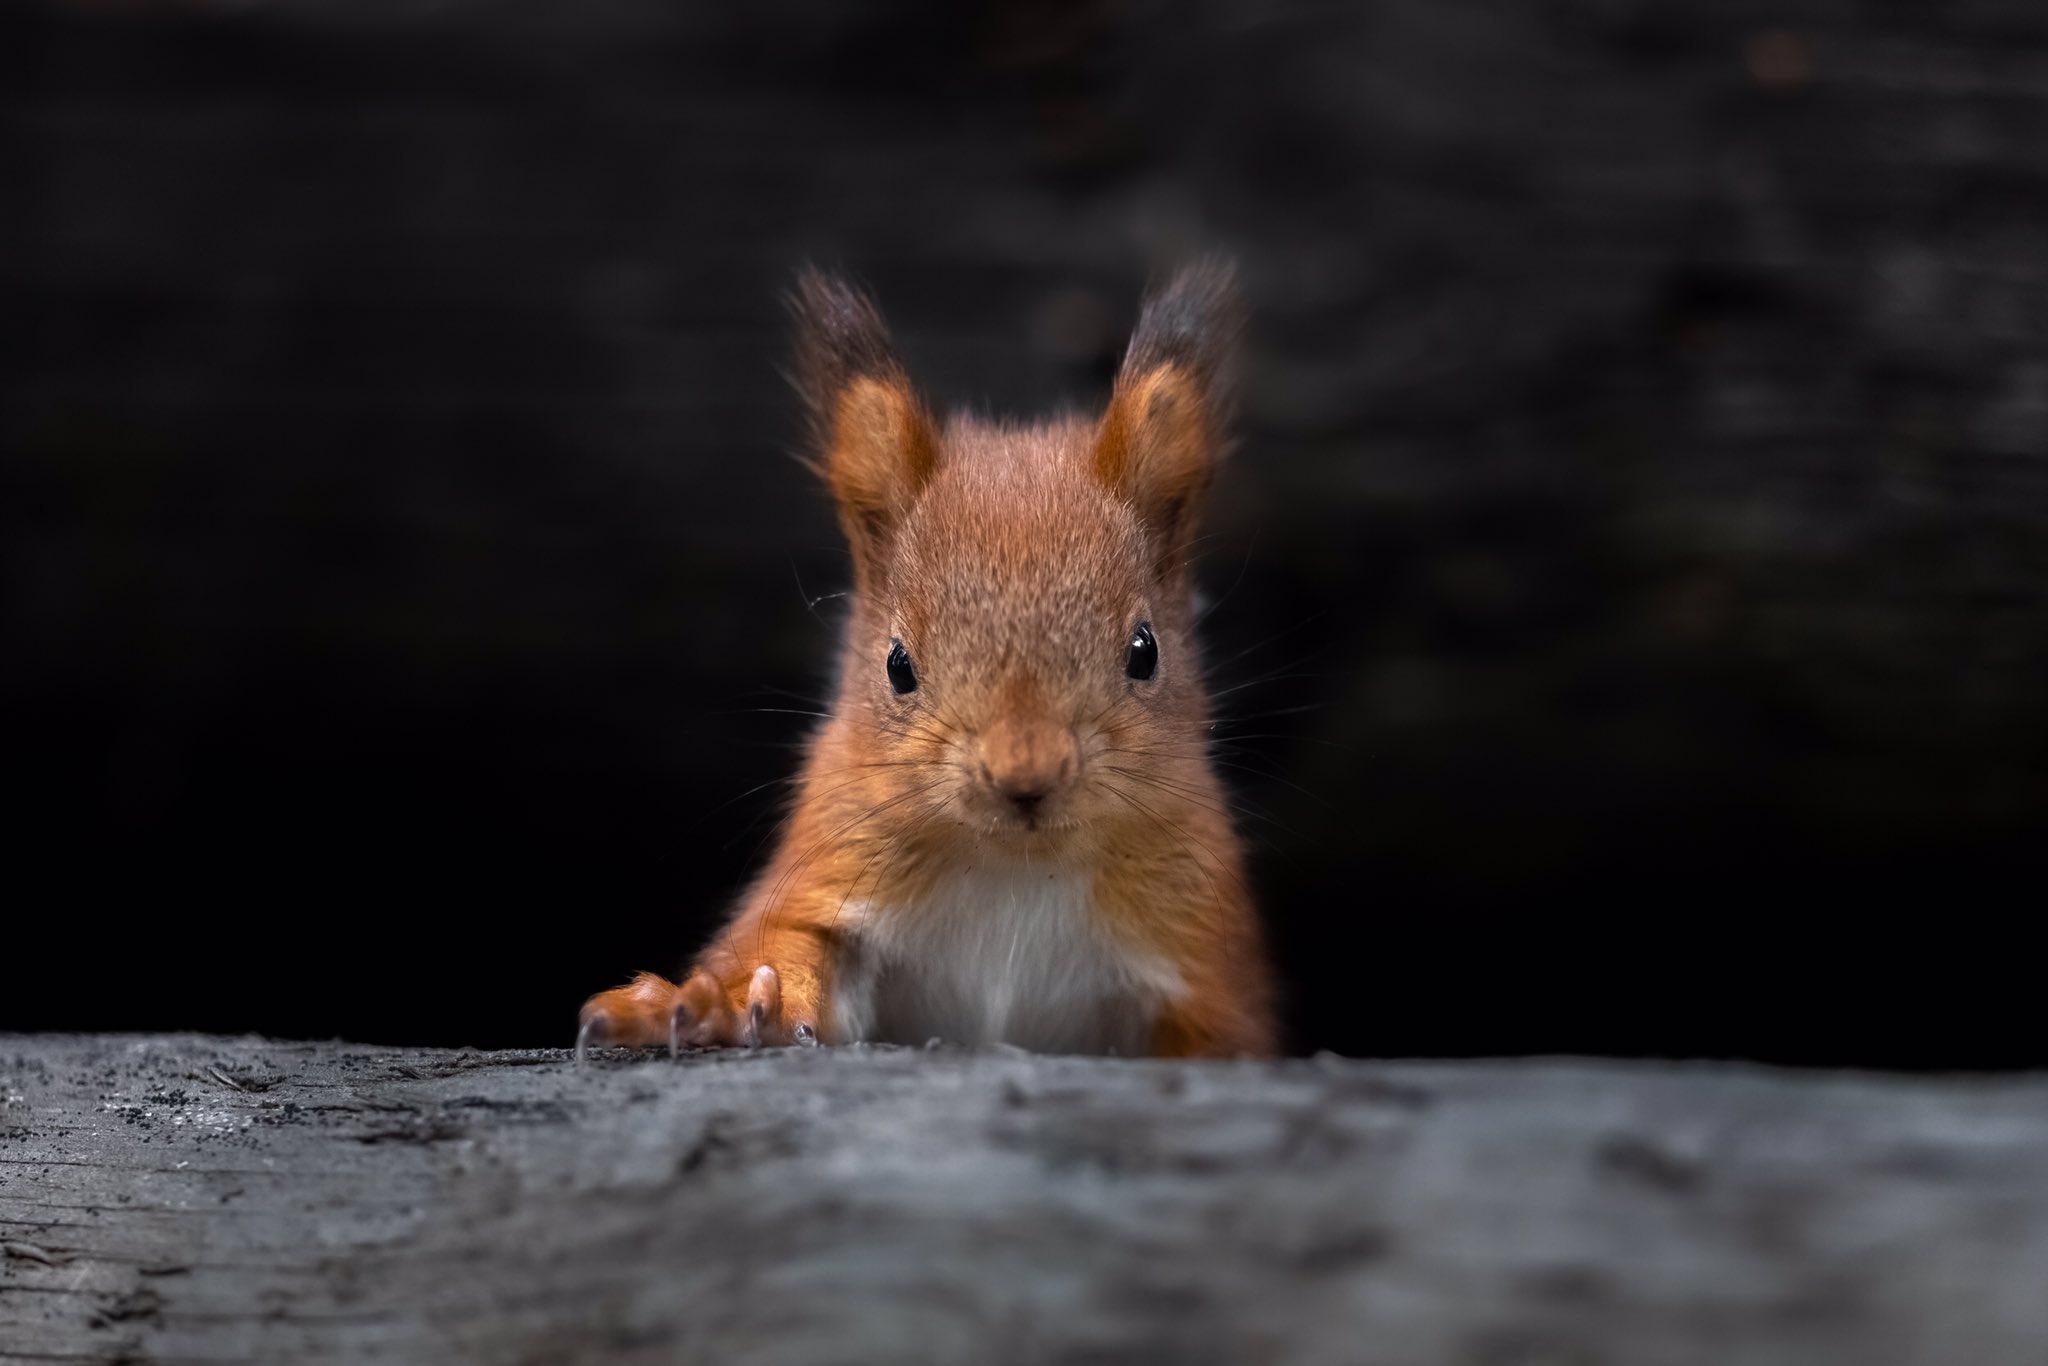 fotografa-registra-esquilos-bebes